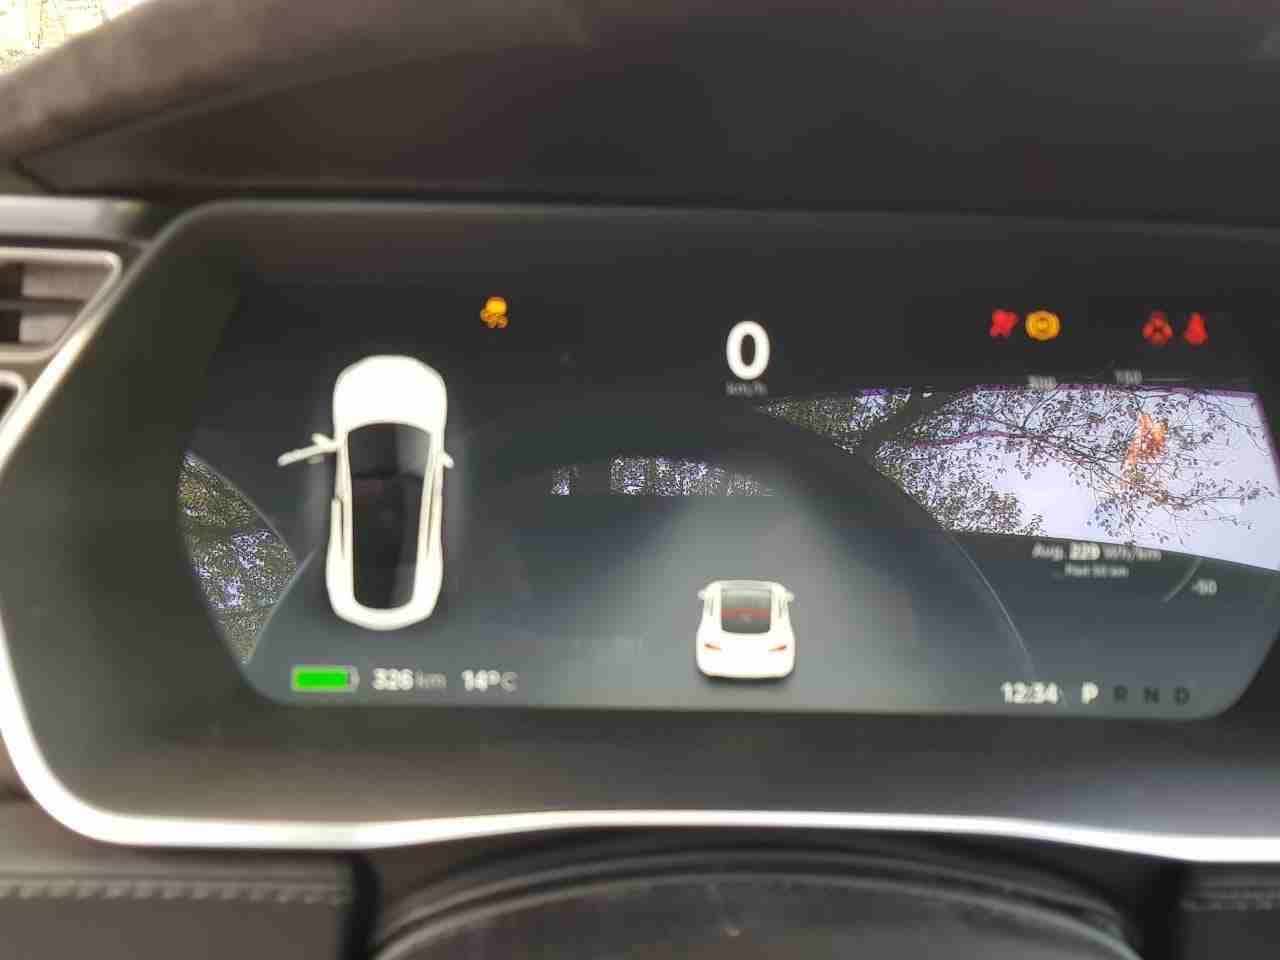 فورد رابتور 2017 للبيع-  TESLA 2015 كهربا S 85...